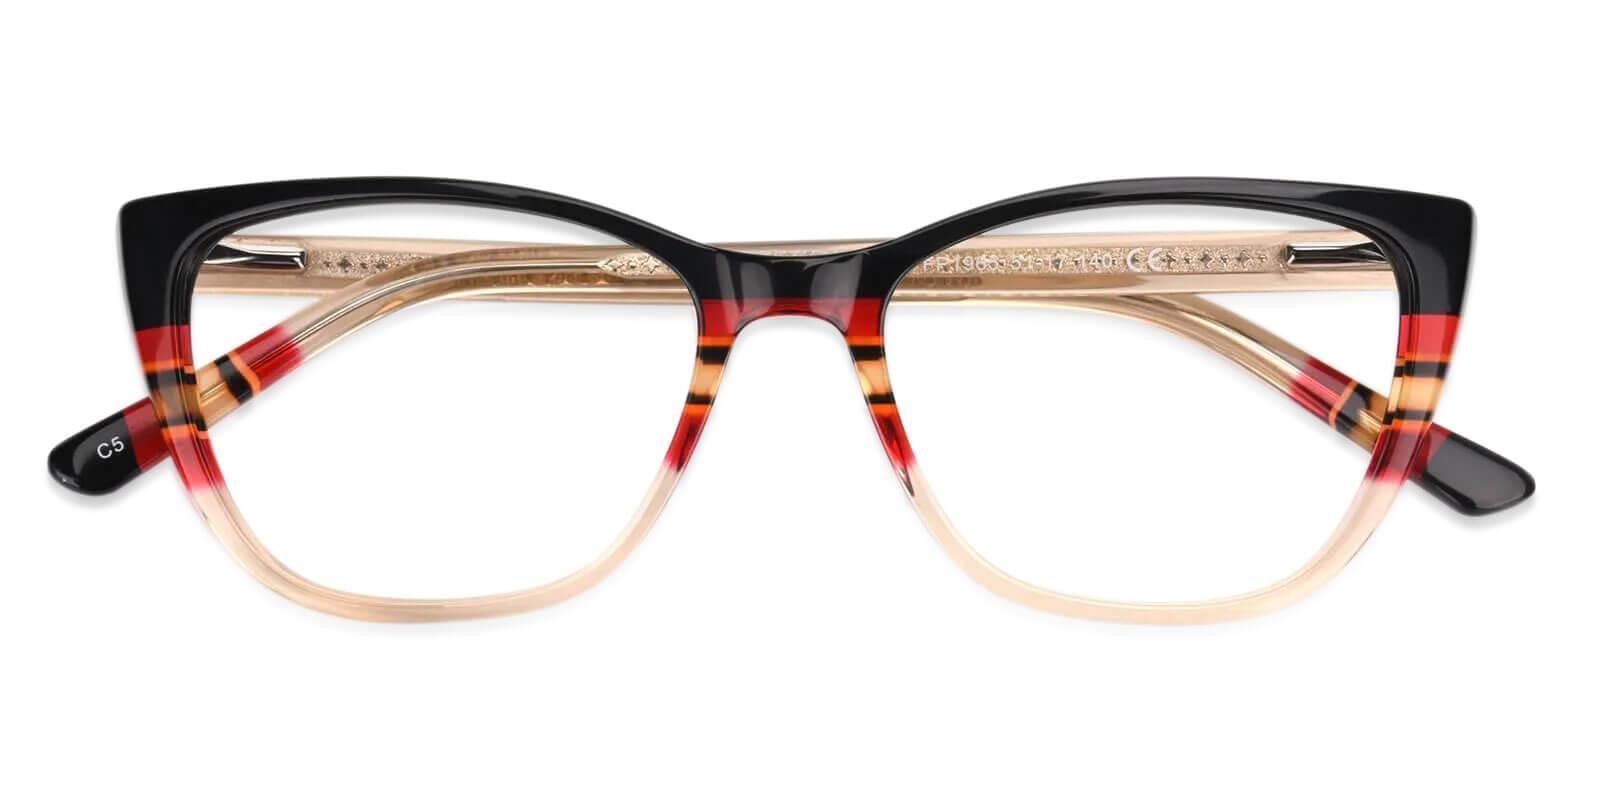 Prague Yellow Acetate Eyeglasses , UniversalBridgeFit Frames from ABBE Glasses